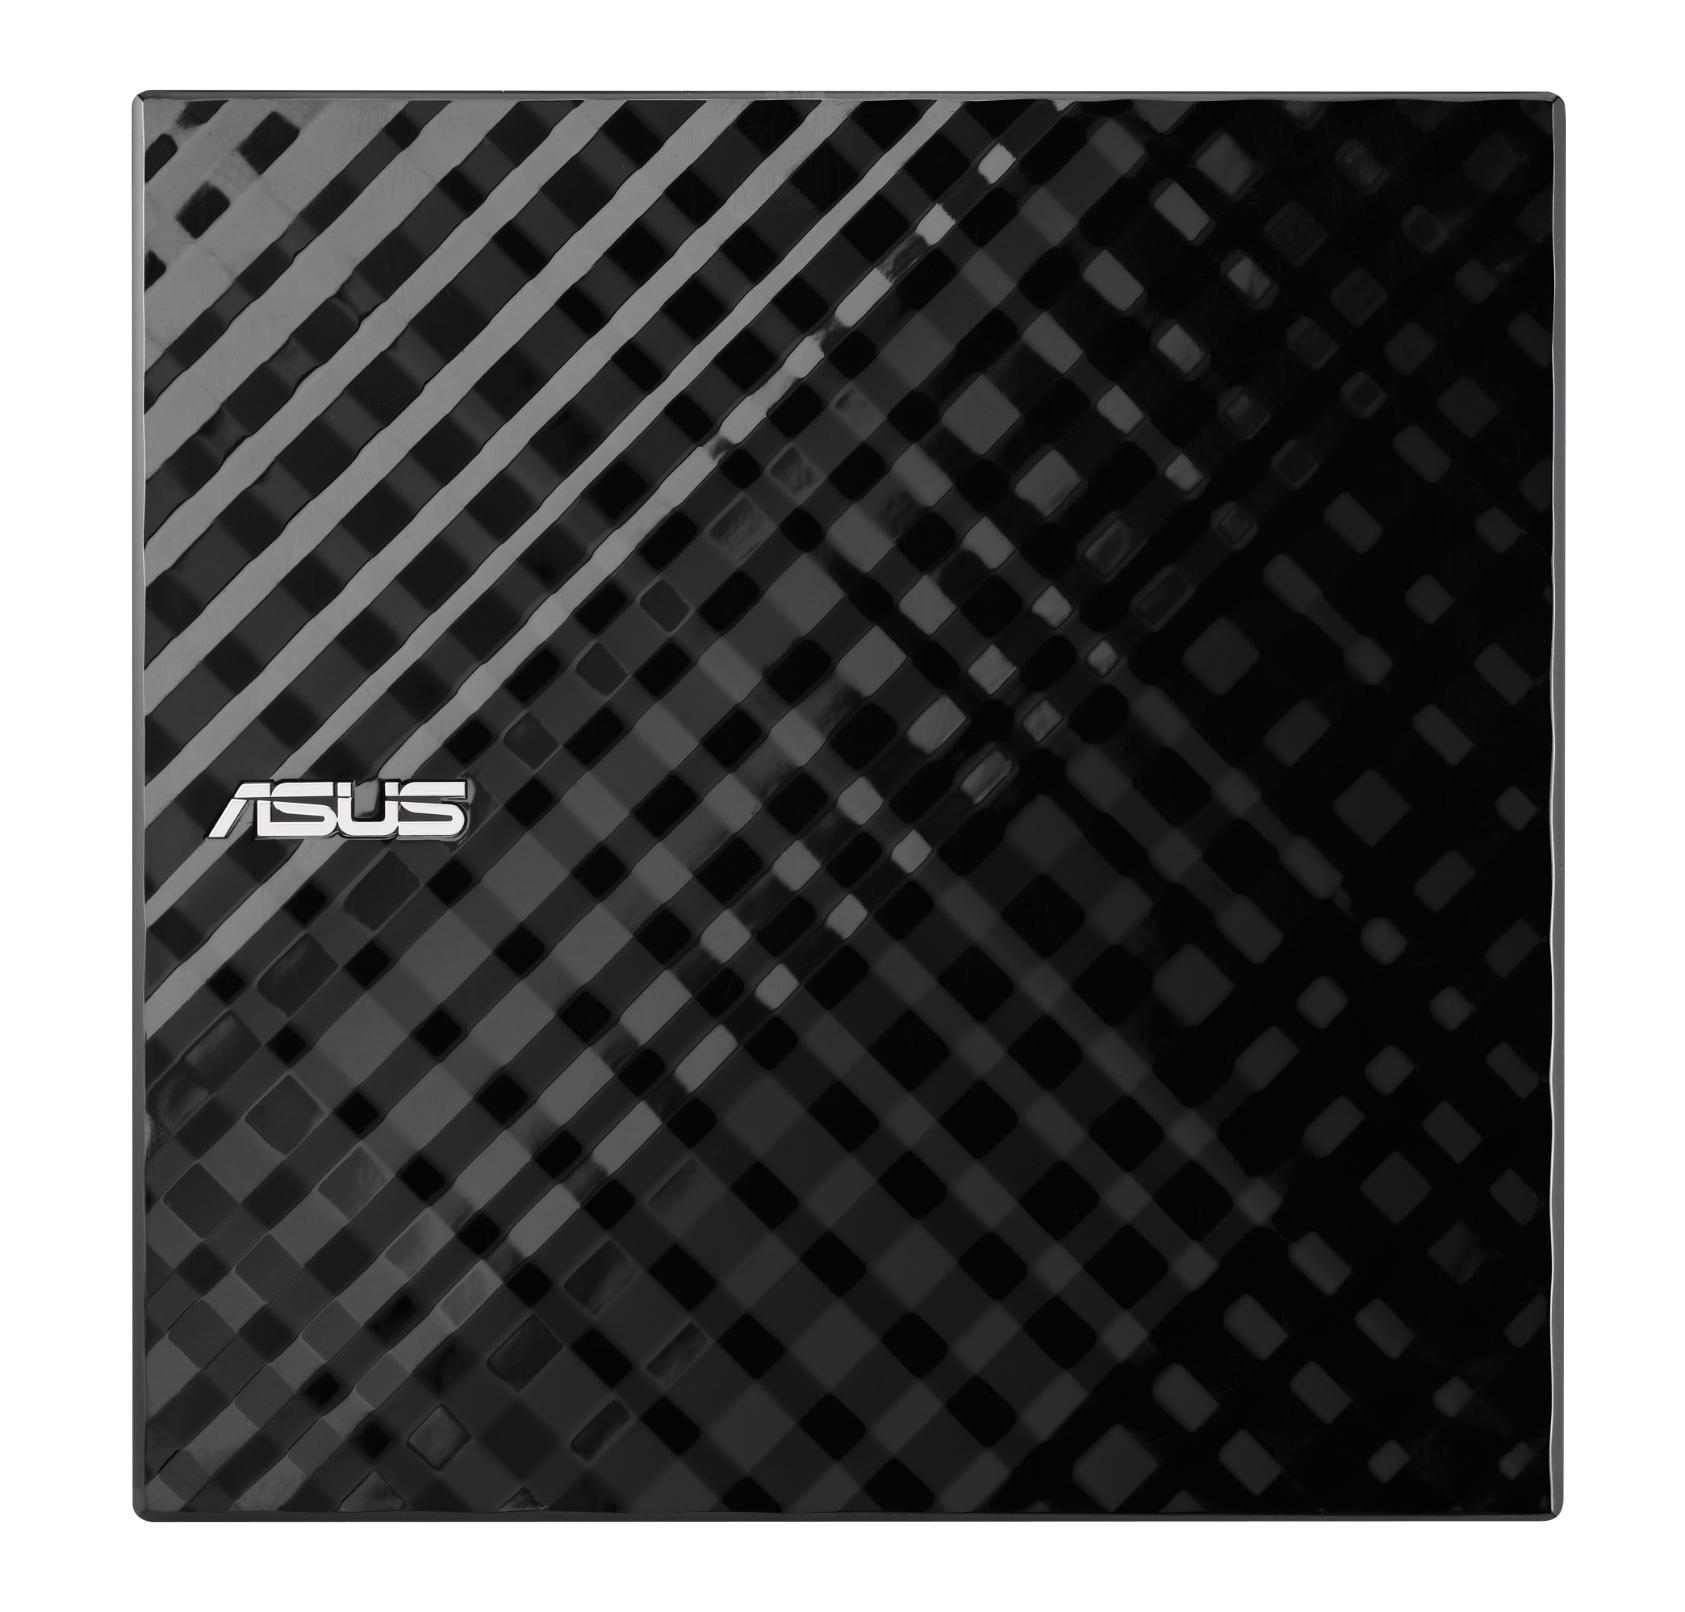 Външно USB DVD записващо устройство ASUS SDRW-08D2S-U LITE, USB 2.0, черно-2